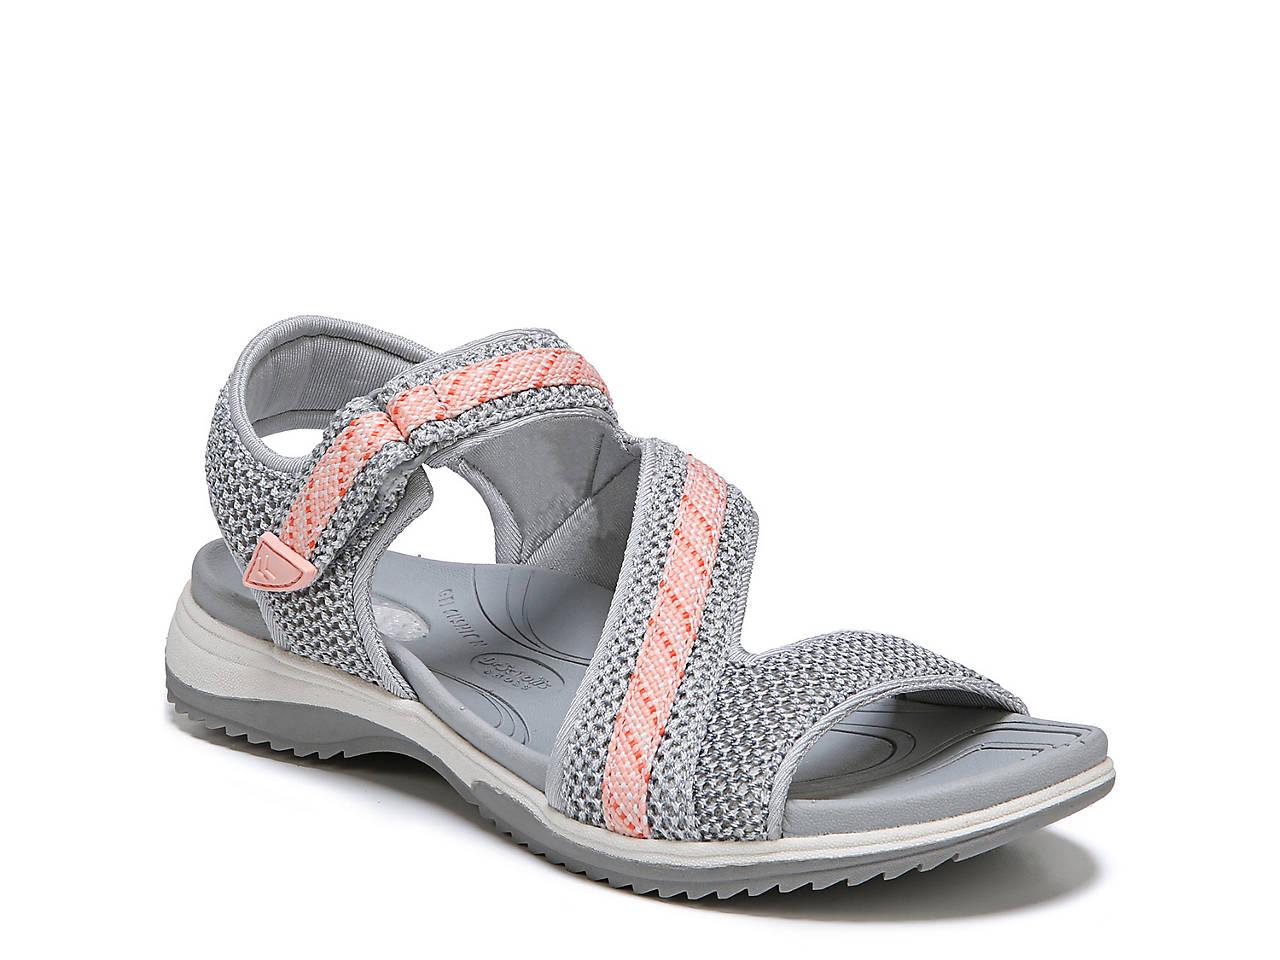 Dr. Scholl's® Daydream Sandal DejgD